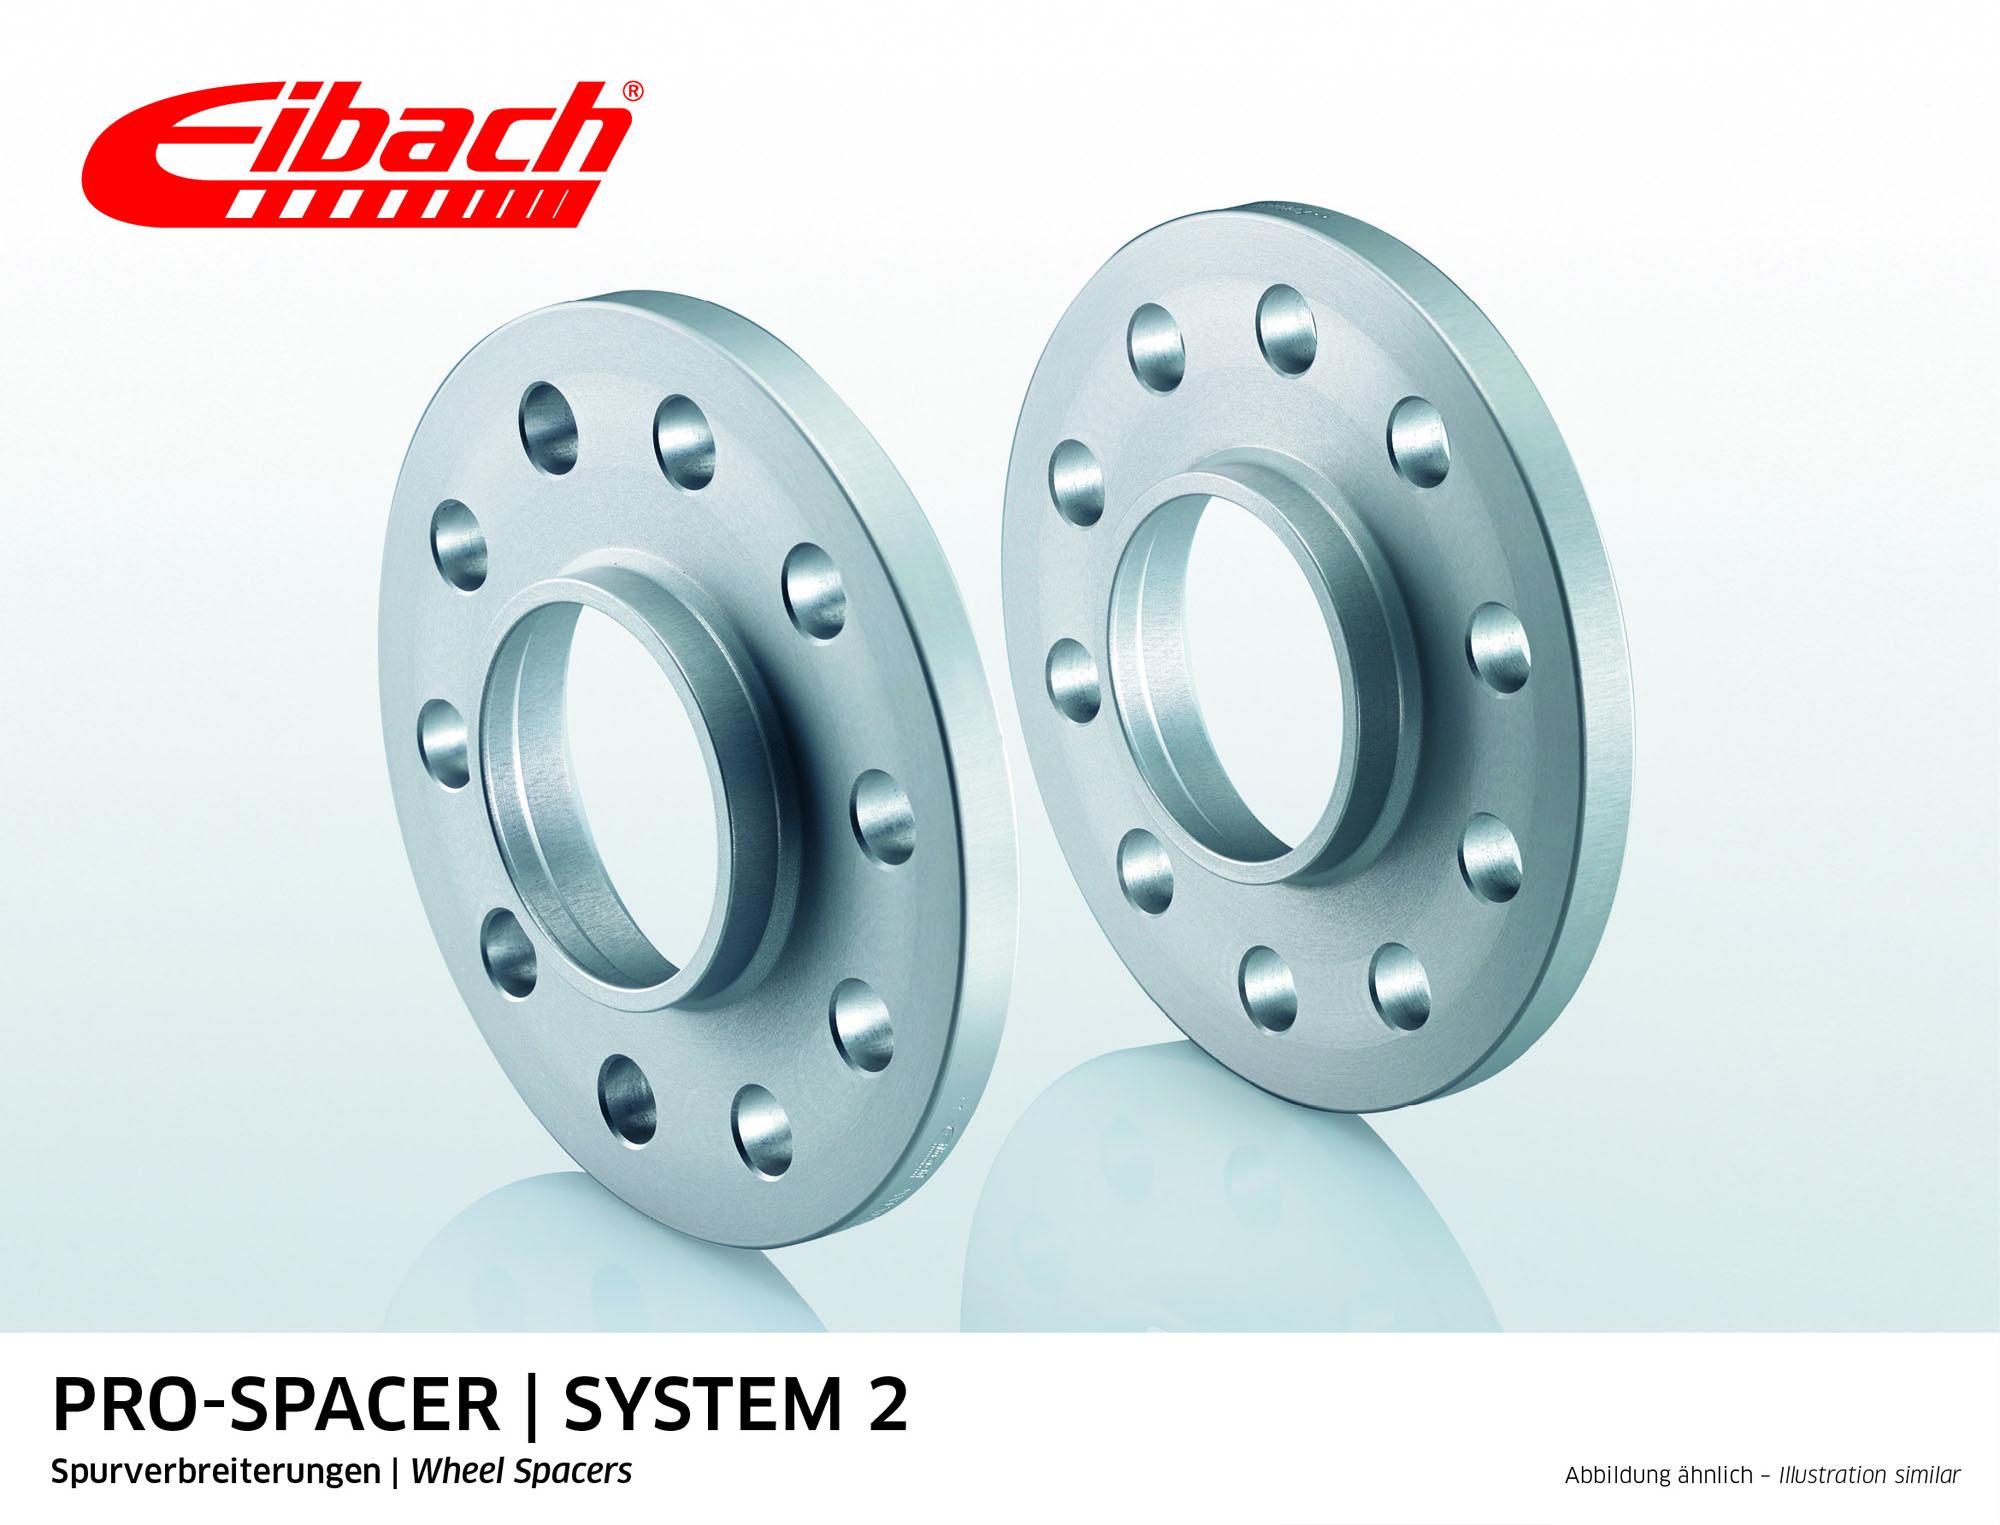 Eibach S90-2-15-002 Pro-Spacer